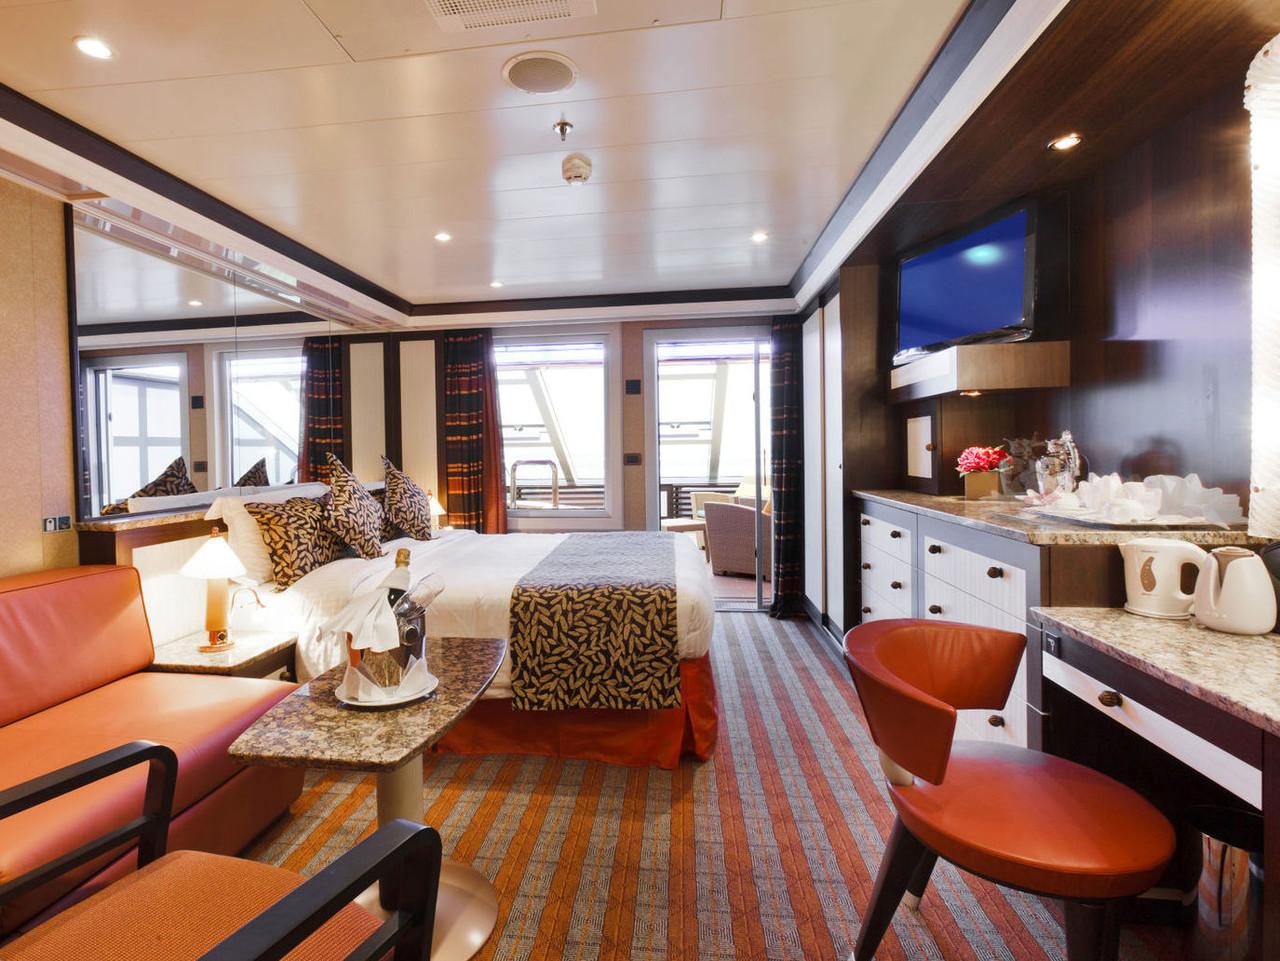 Suiten der costa fascinosa kabinenaustattung guide for Costa pacifica recensioni